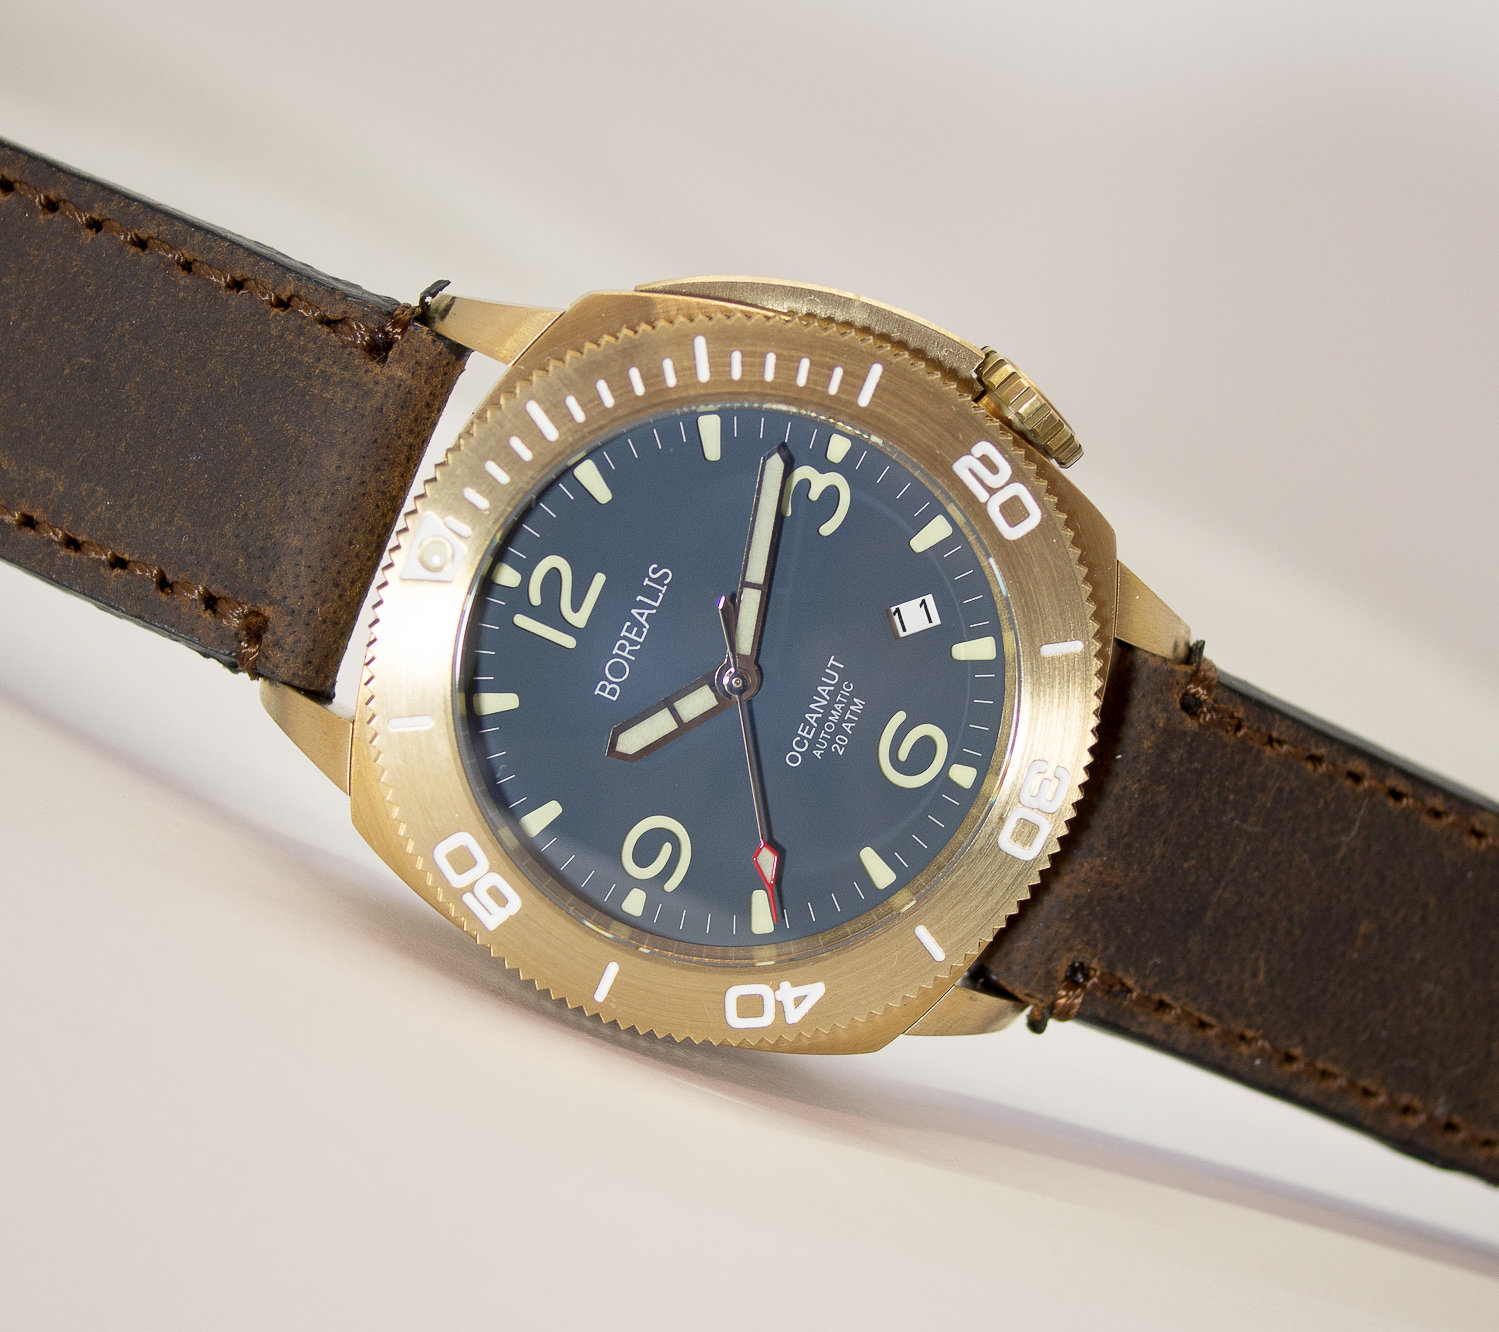 Borealis Oceanaut Aluminum Bronze Teal Blue Date 200m NH35 Automatic Diver Watch